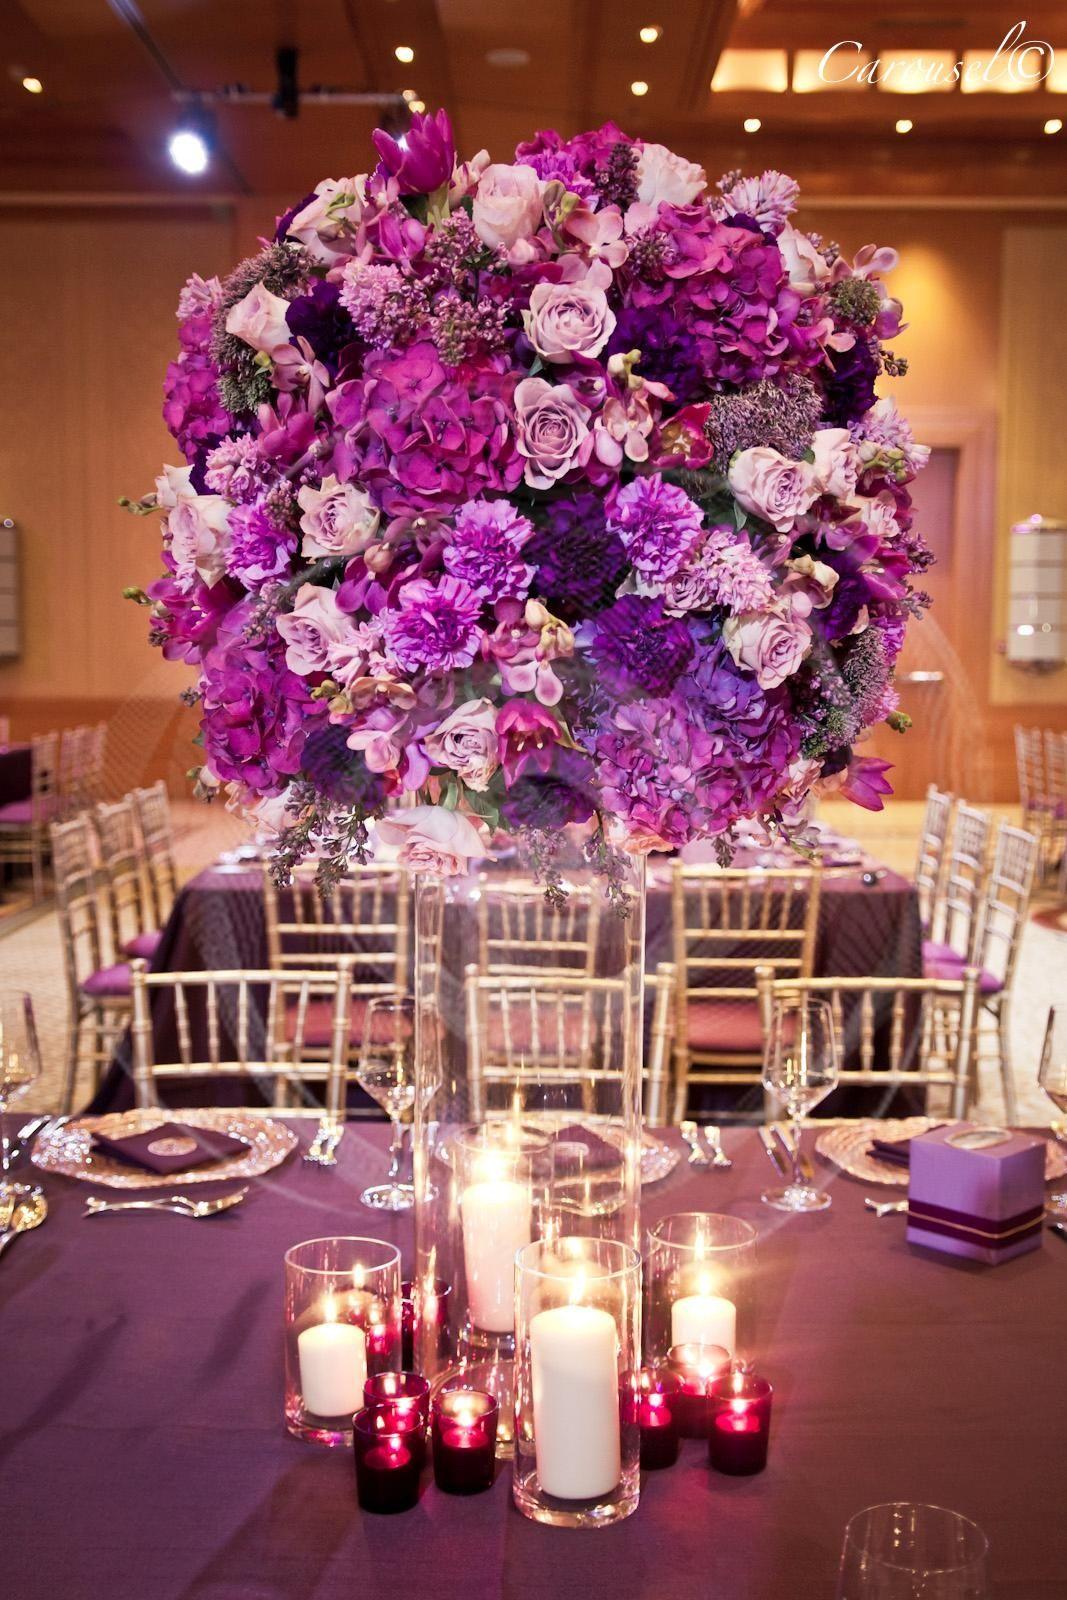 Pin by Vanessa Rodriguez on Future wedding | Pinterest ...